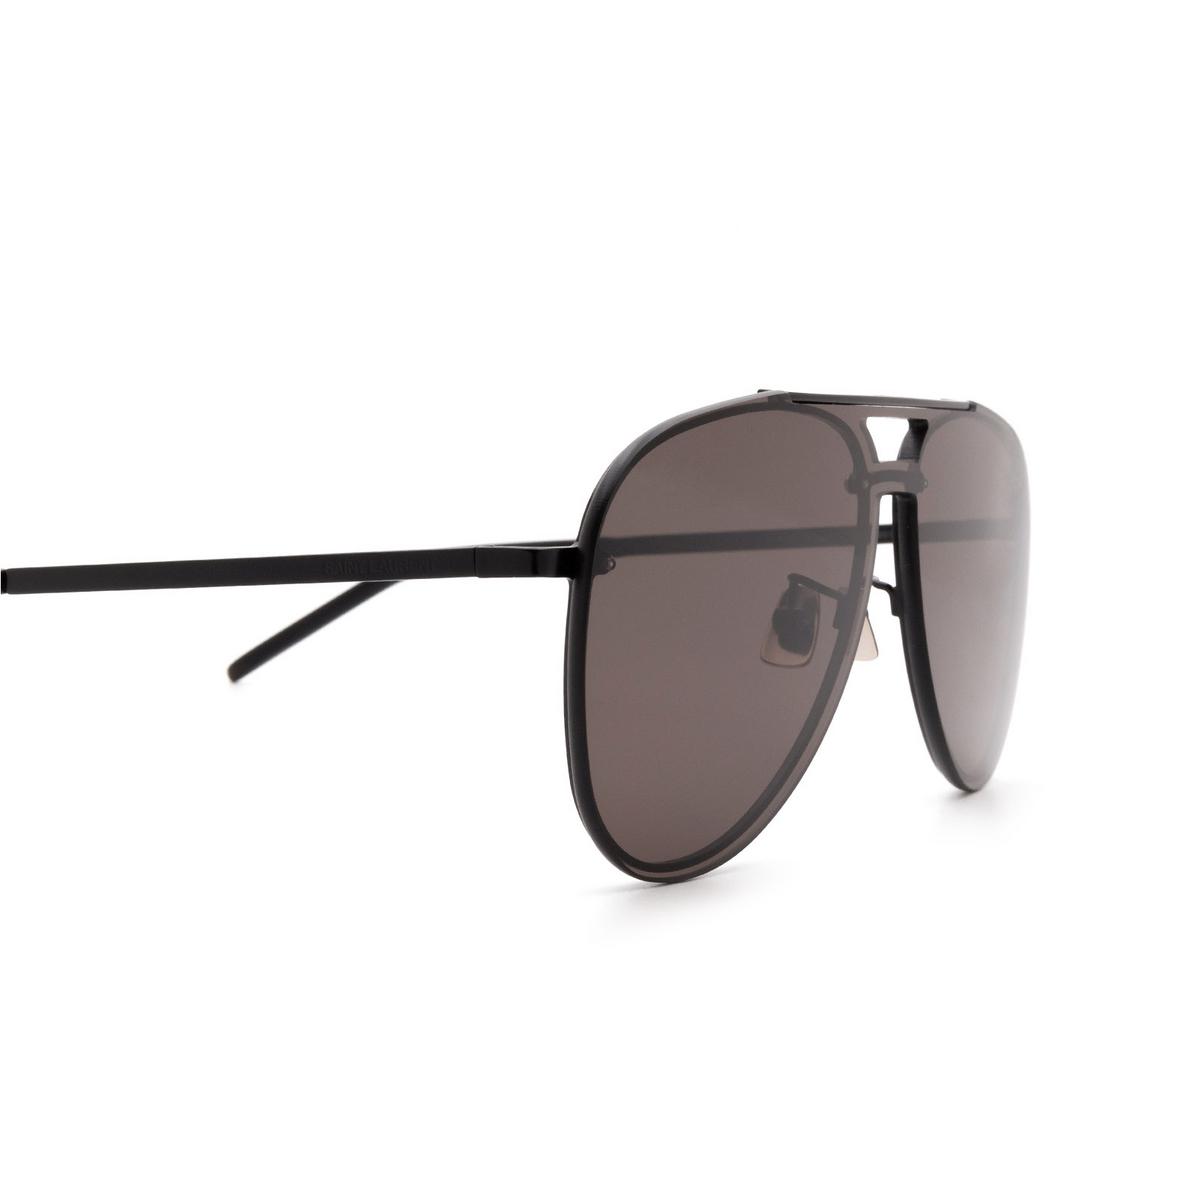 Saint Laurent® Aviator Sunglasses: CLASSIC 11 MASK color Black 002 - 3/3.